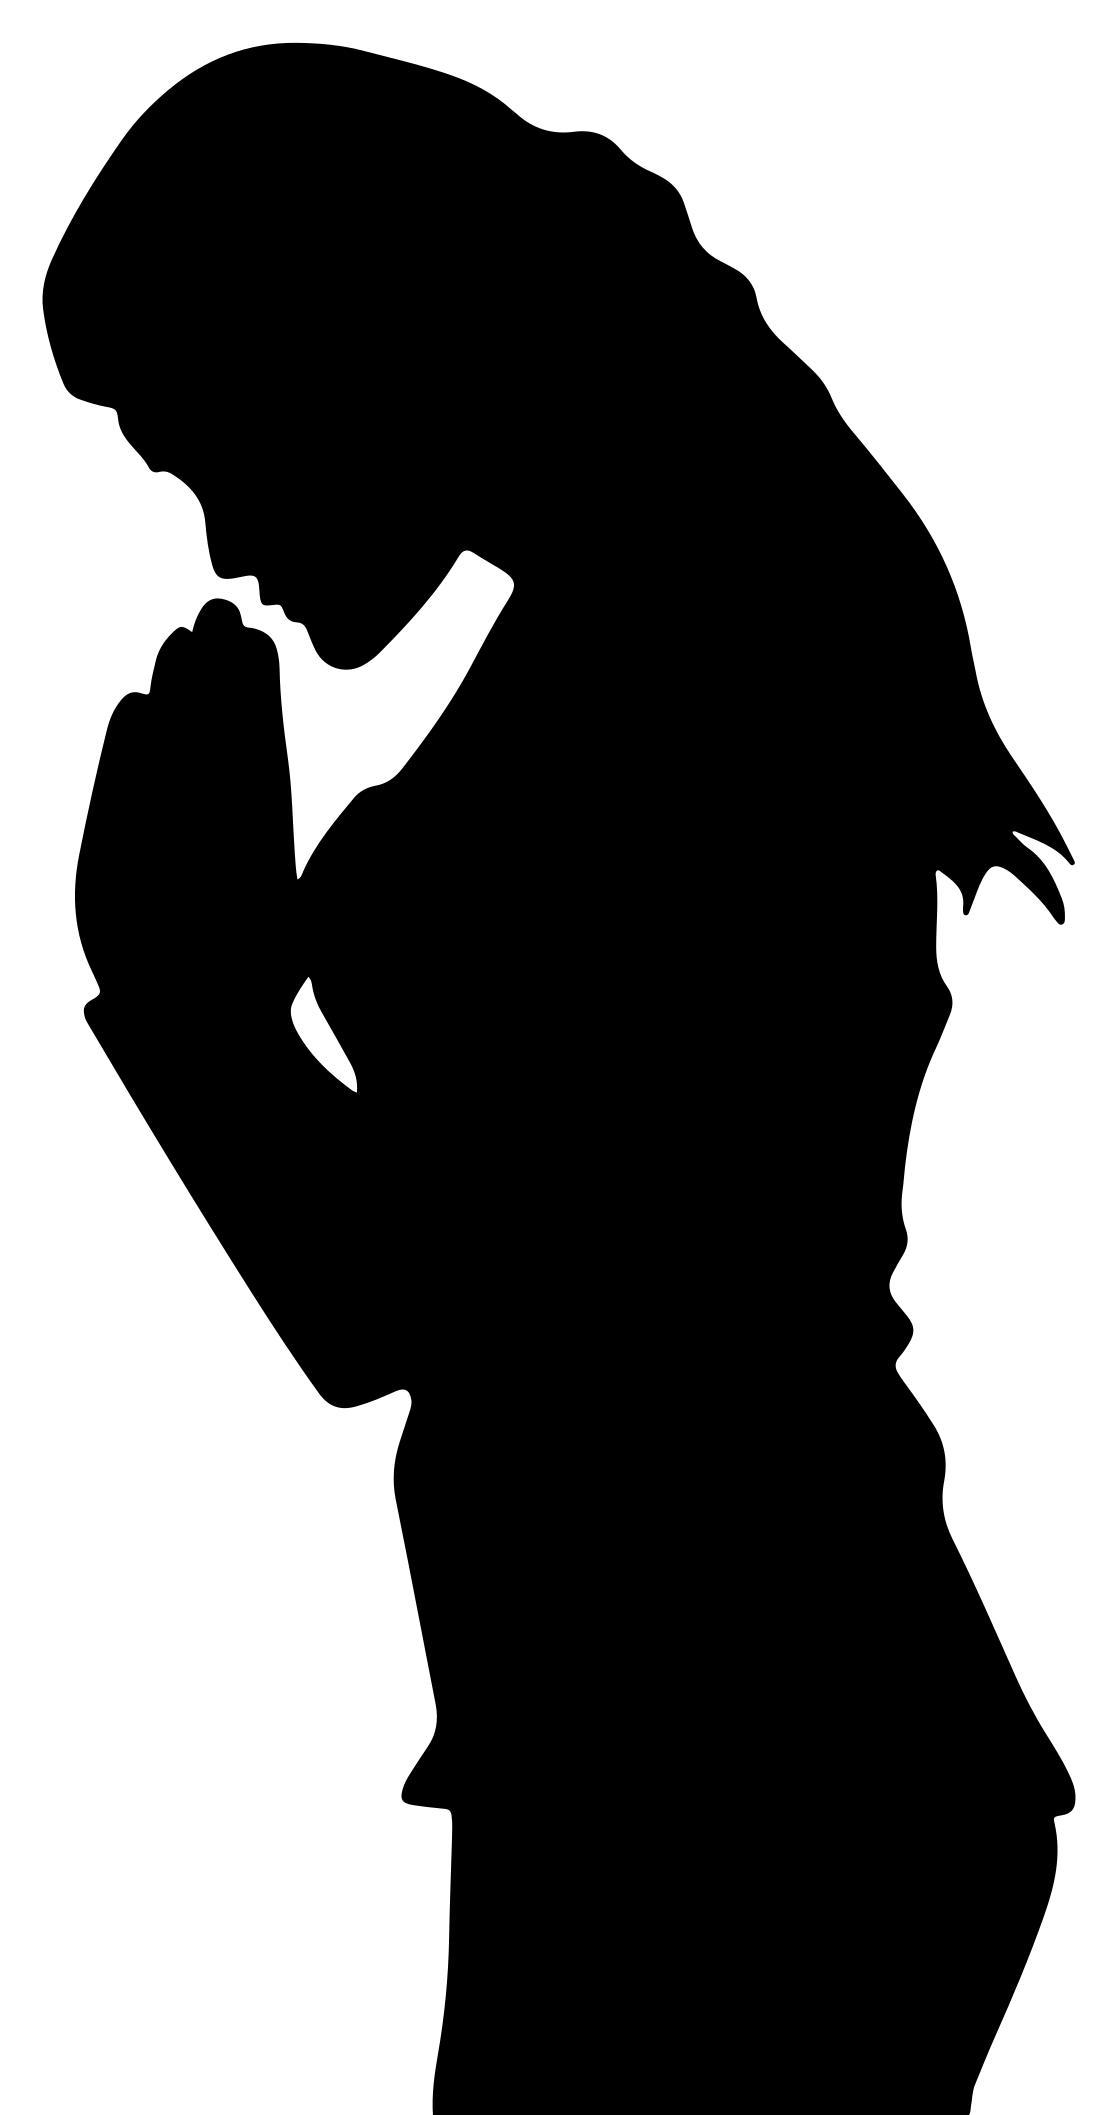 1118x2115 Woman Praying Silhouette Clipart